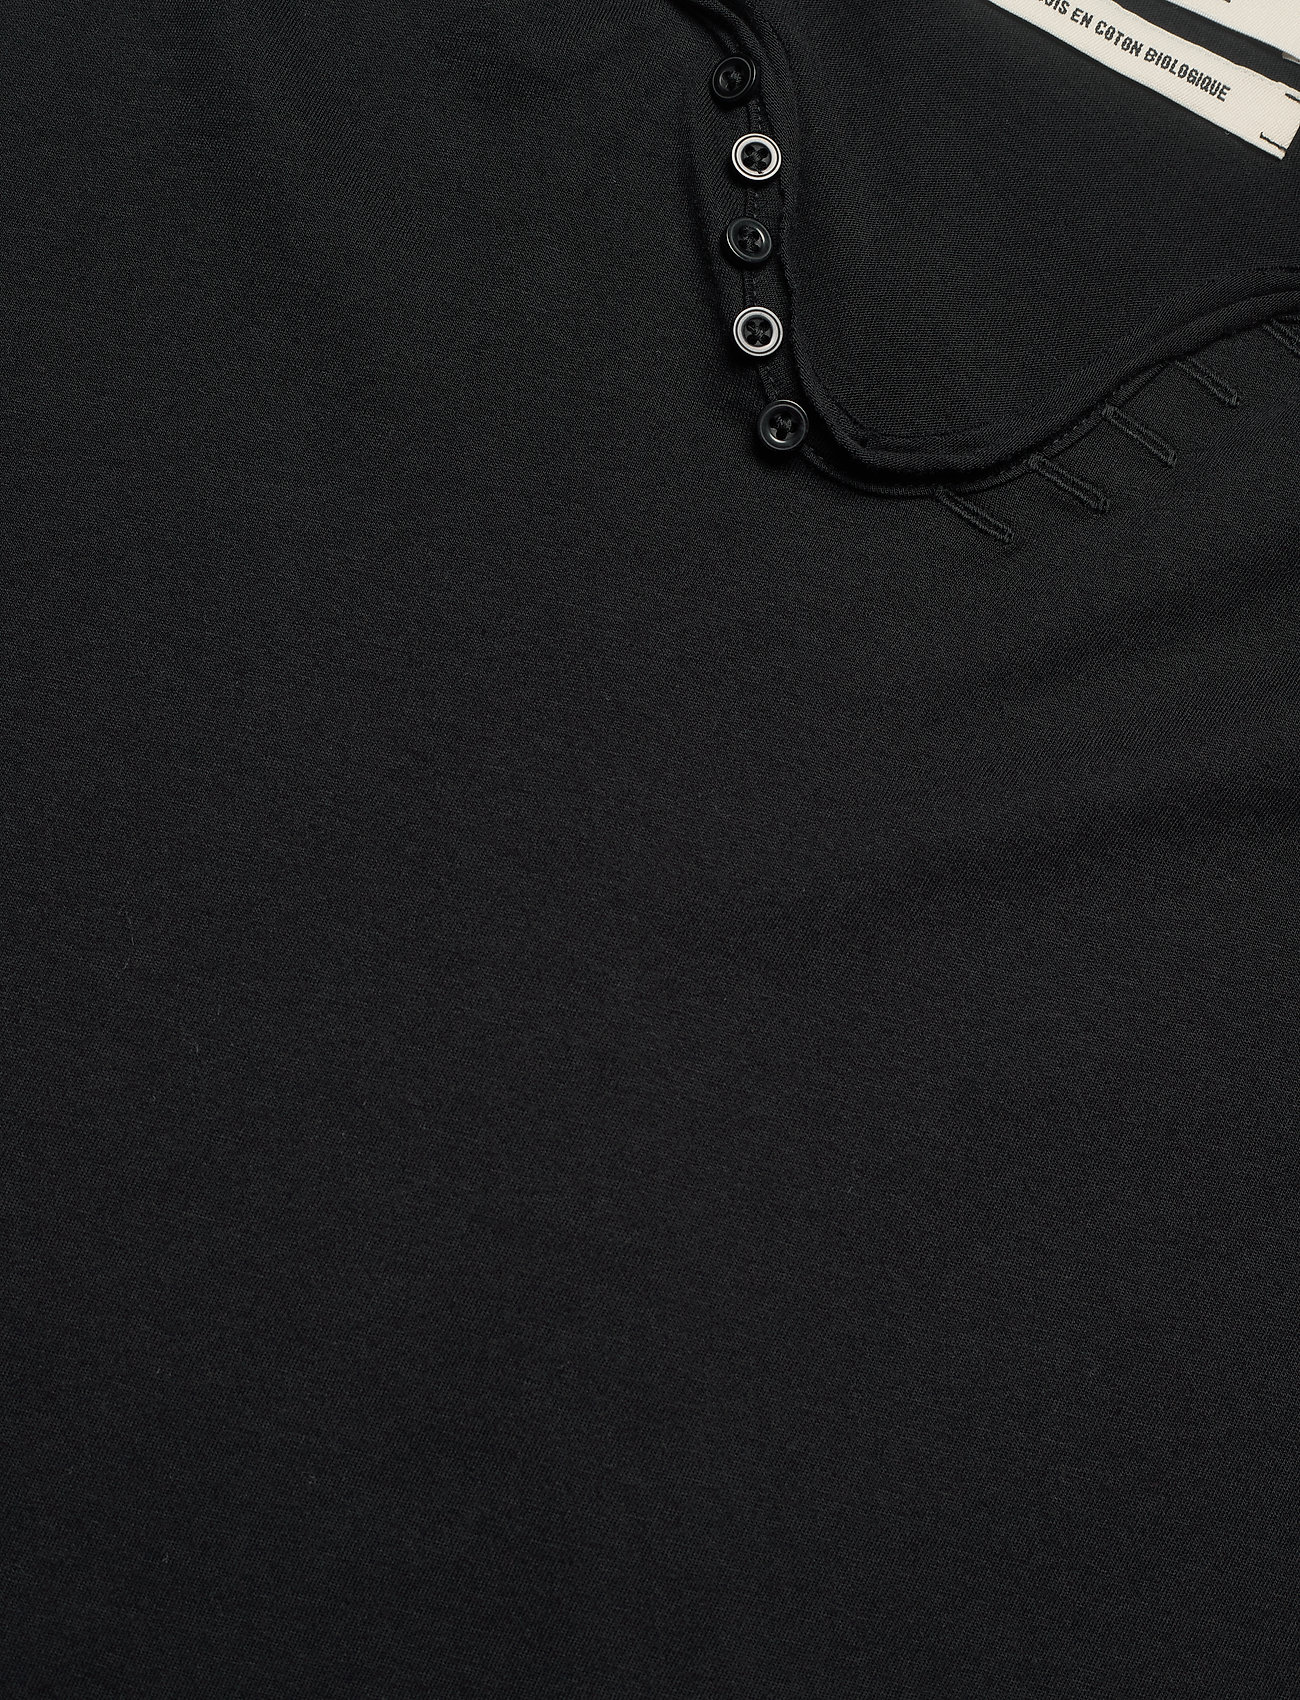 Zadig & Voltaire - MONASTIR MC ECO TUNISIEN MC ECOFRIENDLY - basic t-shirts - black - 2